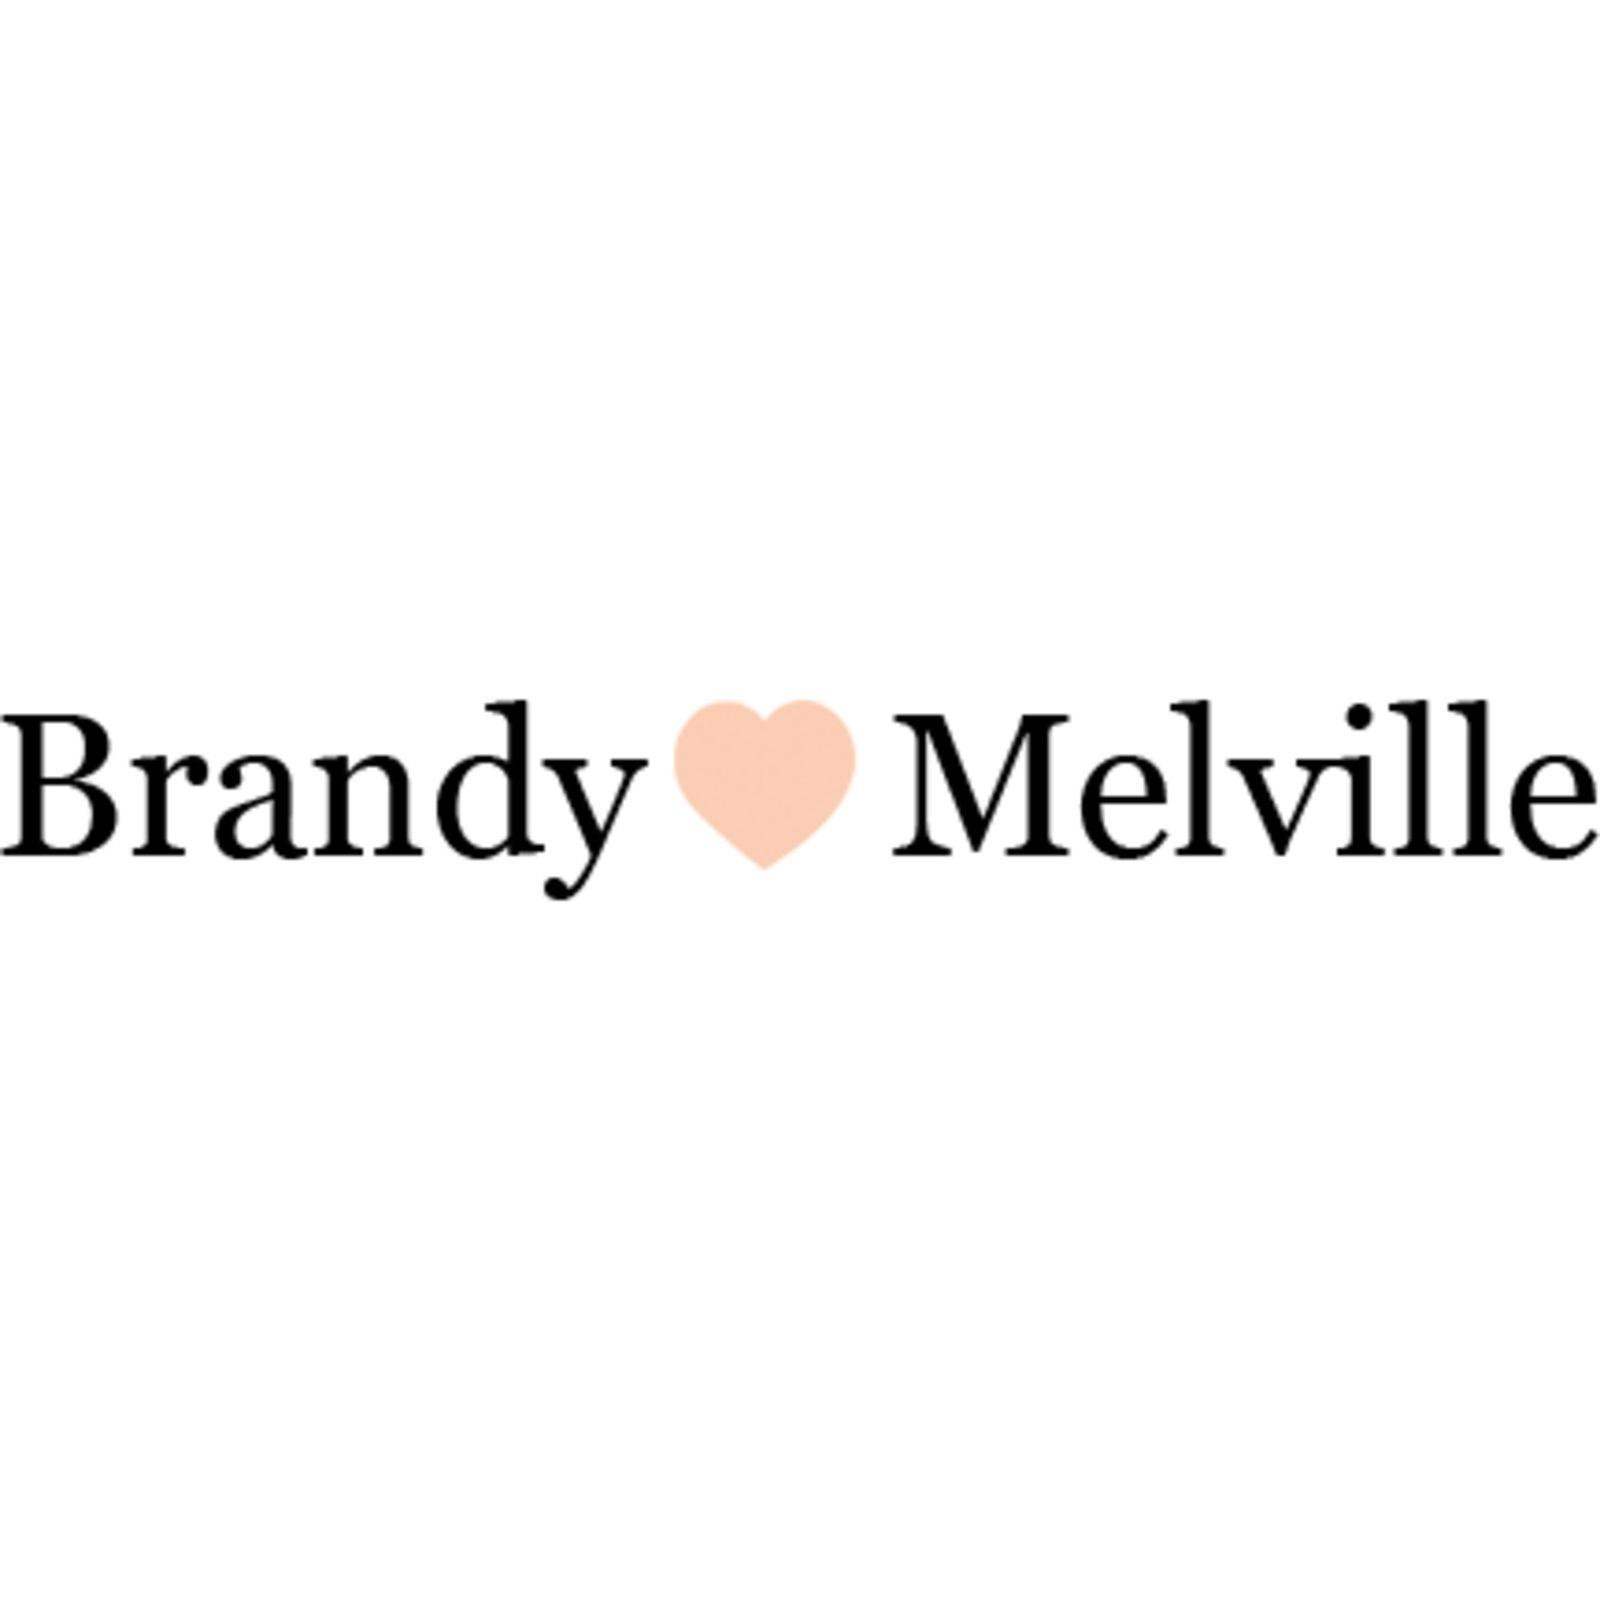 BRANDY & MELVILLE